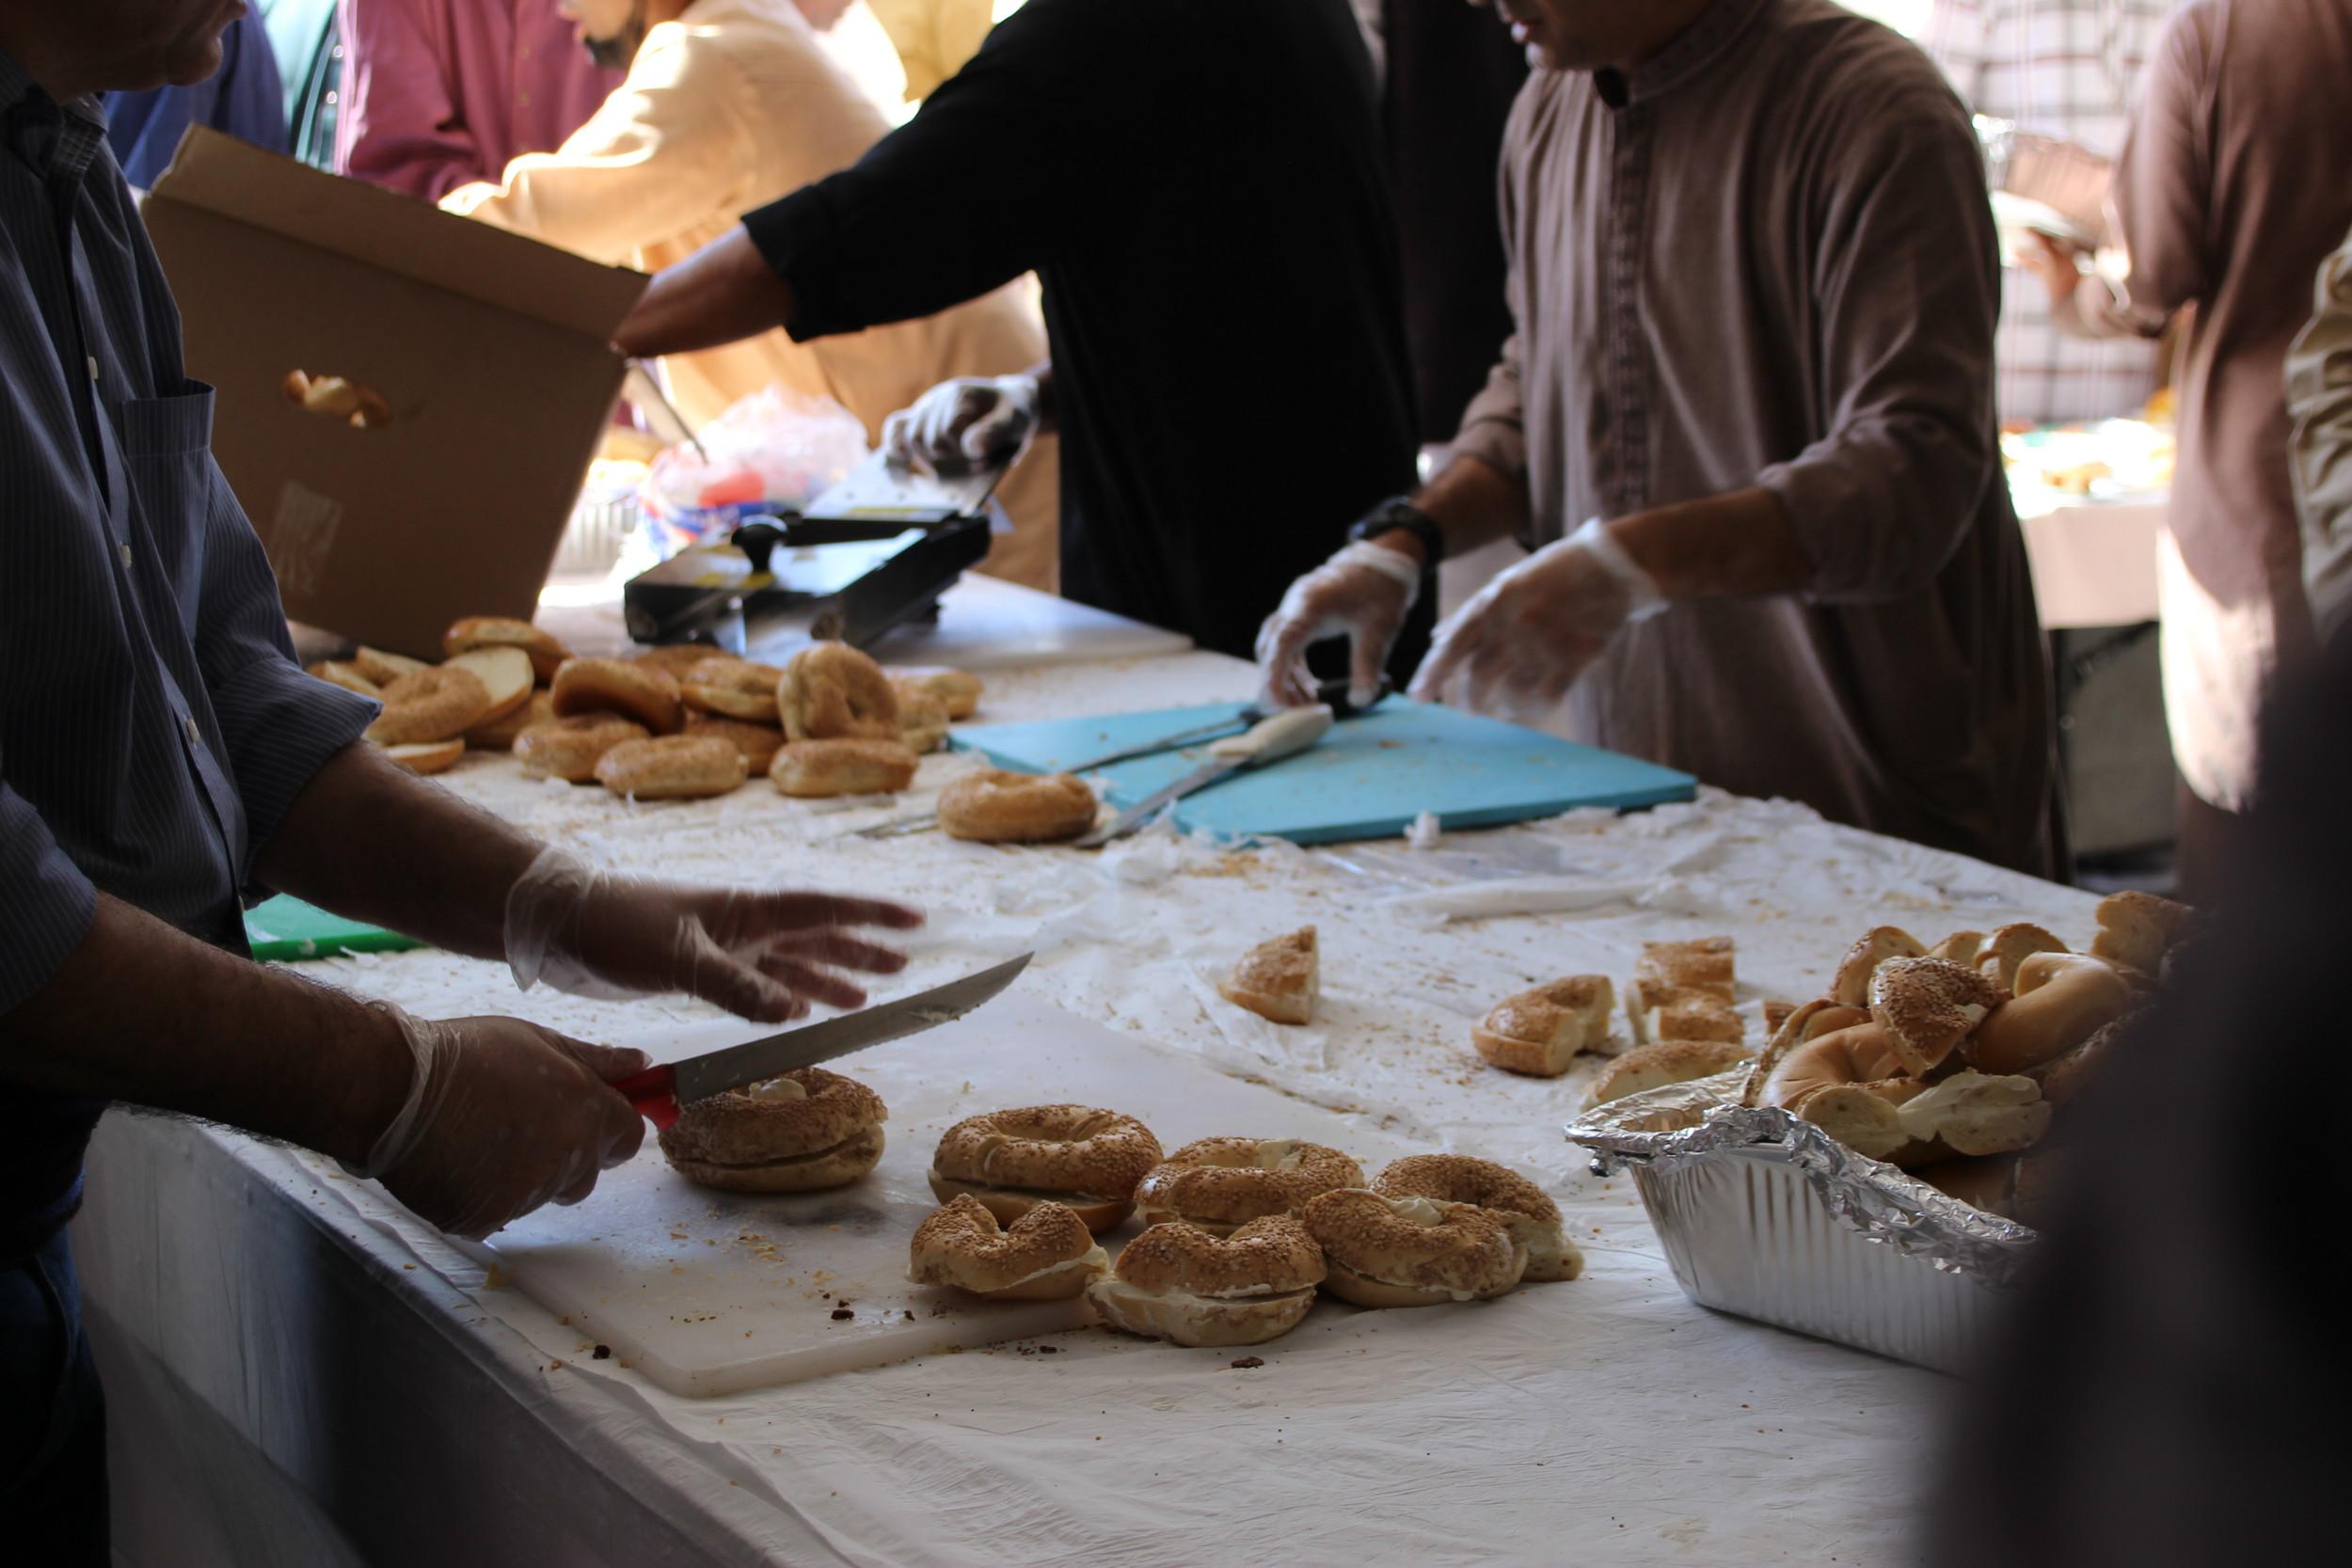 Download Snack Eid Al-Fitr Food - 1498671805_9621  Graphic_23196 .jpg